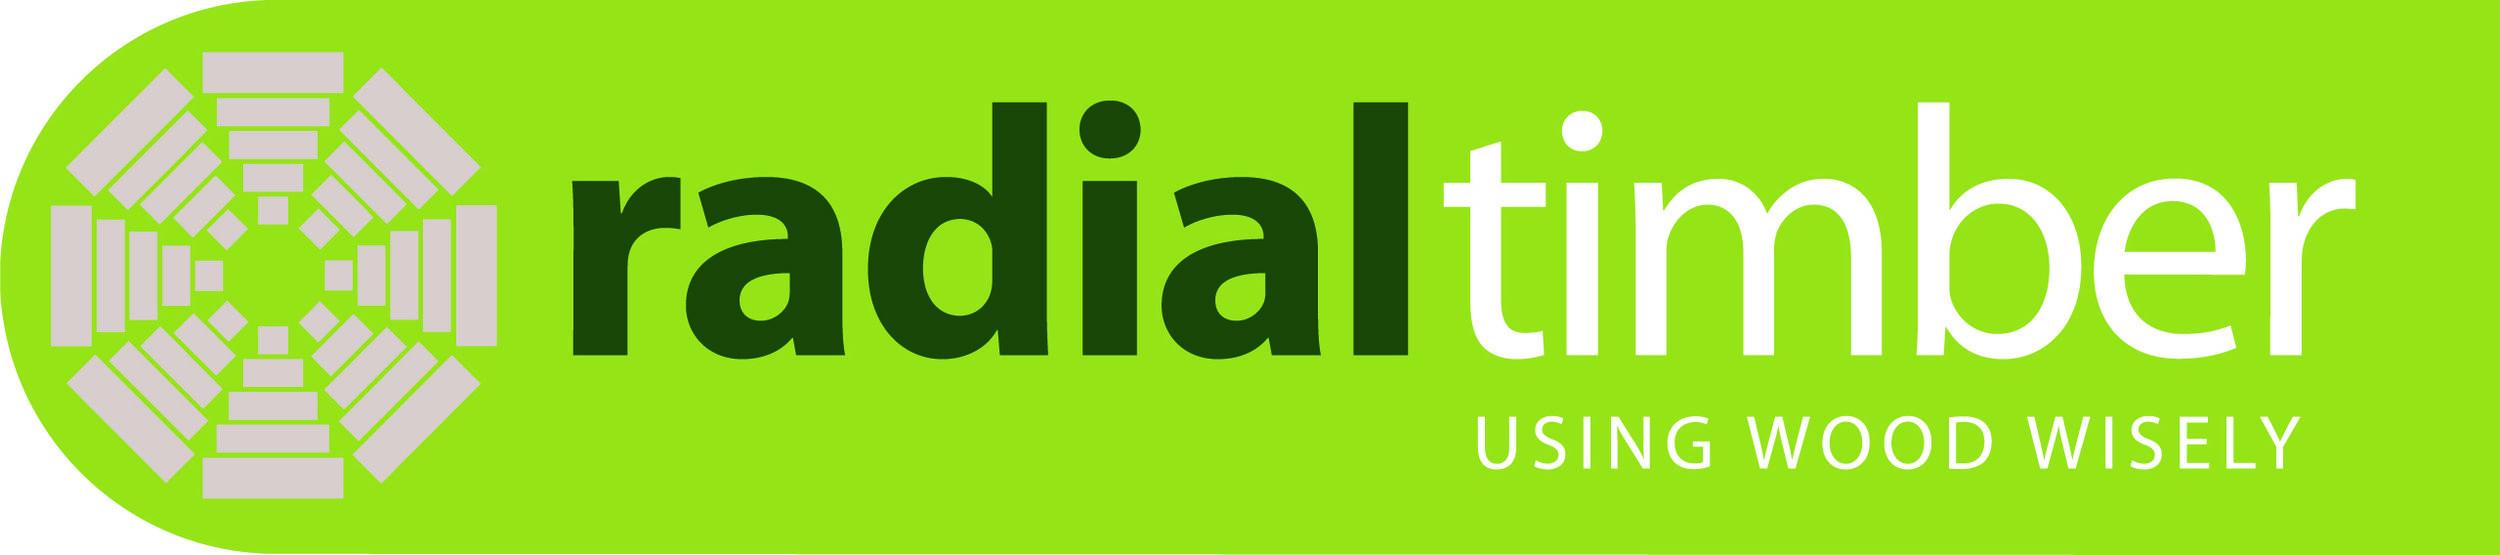 Radial logo style2.jpg